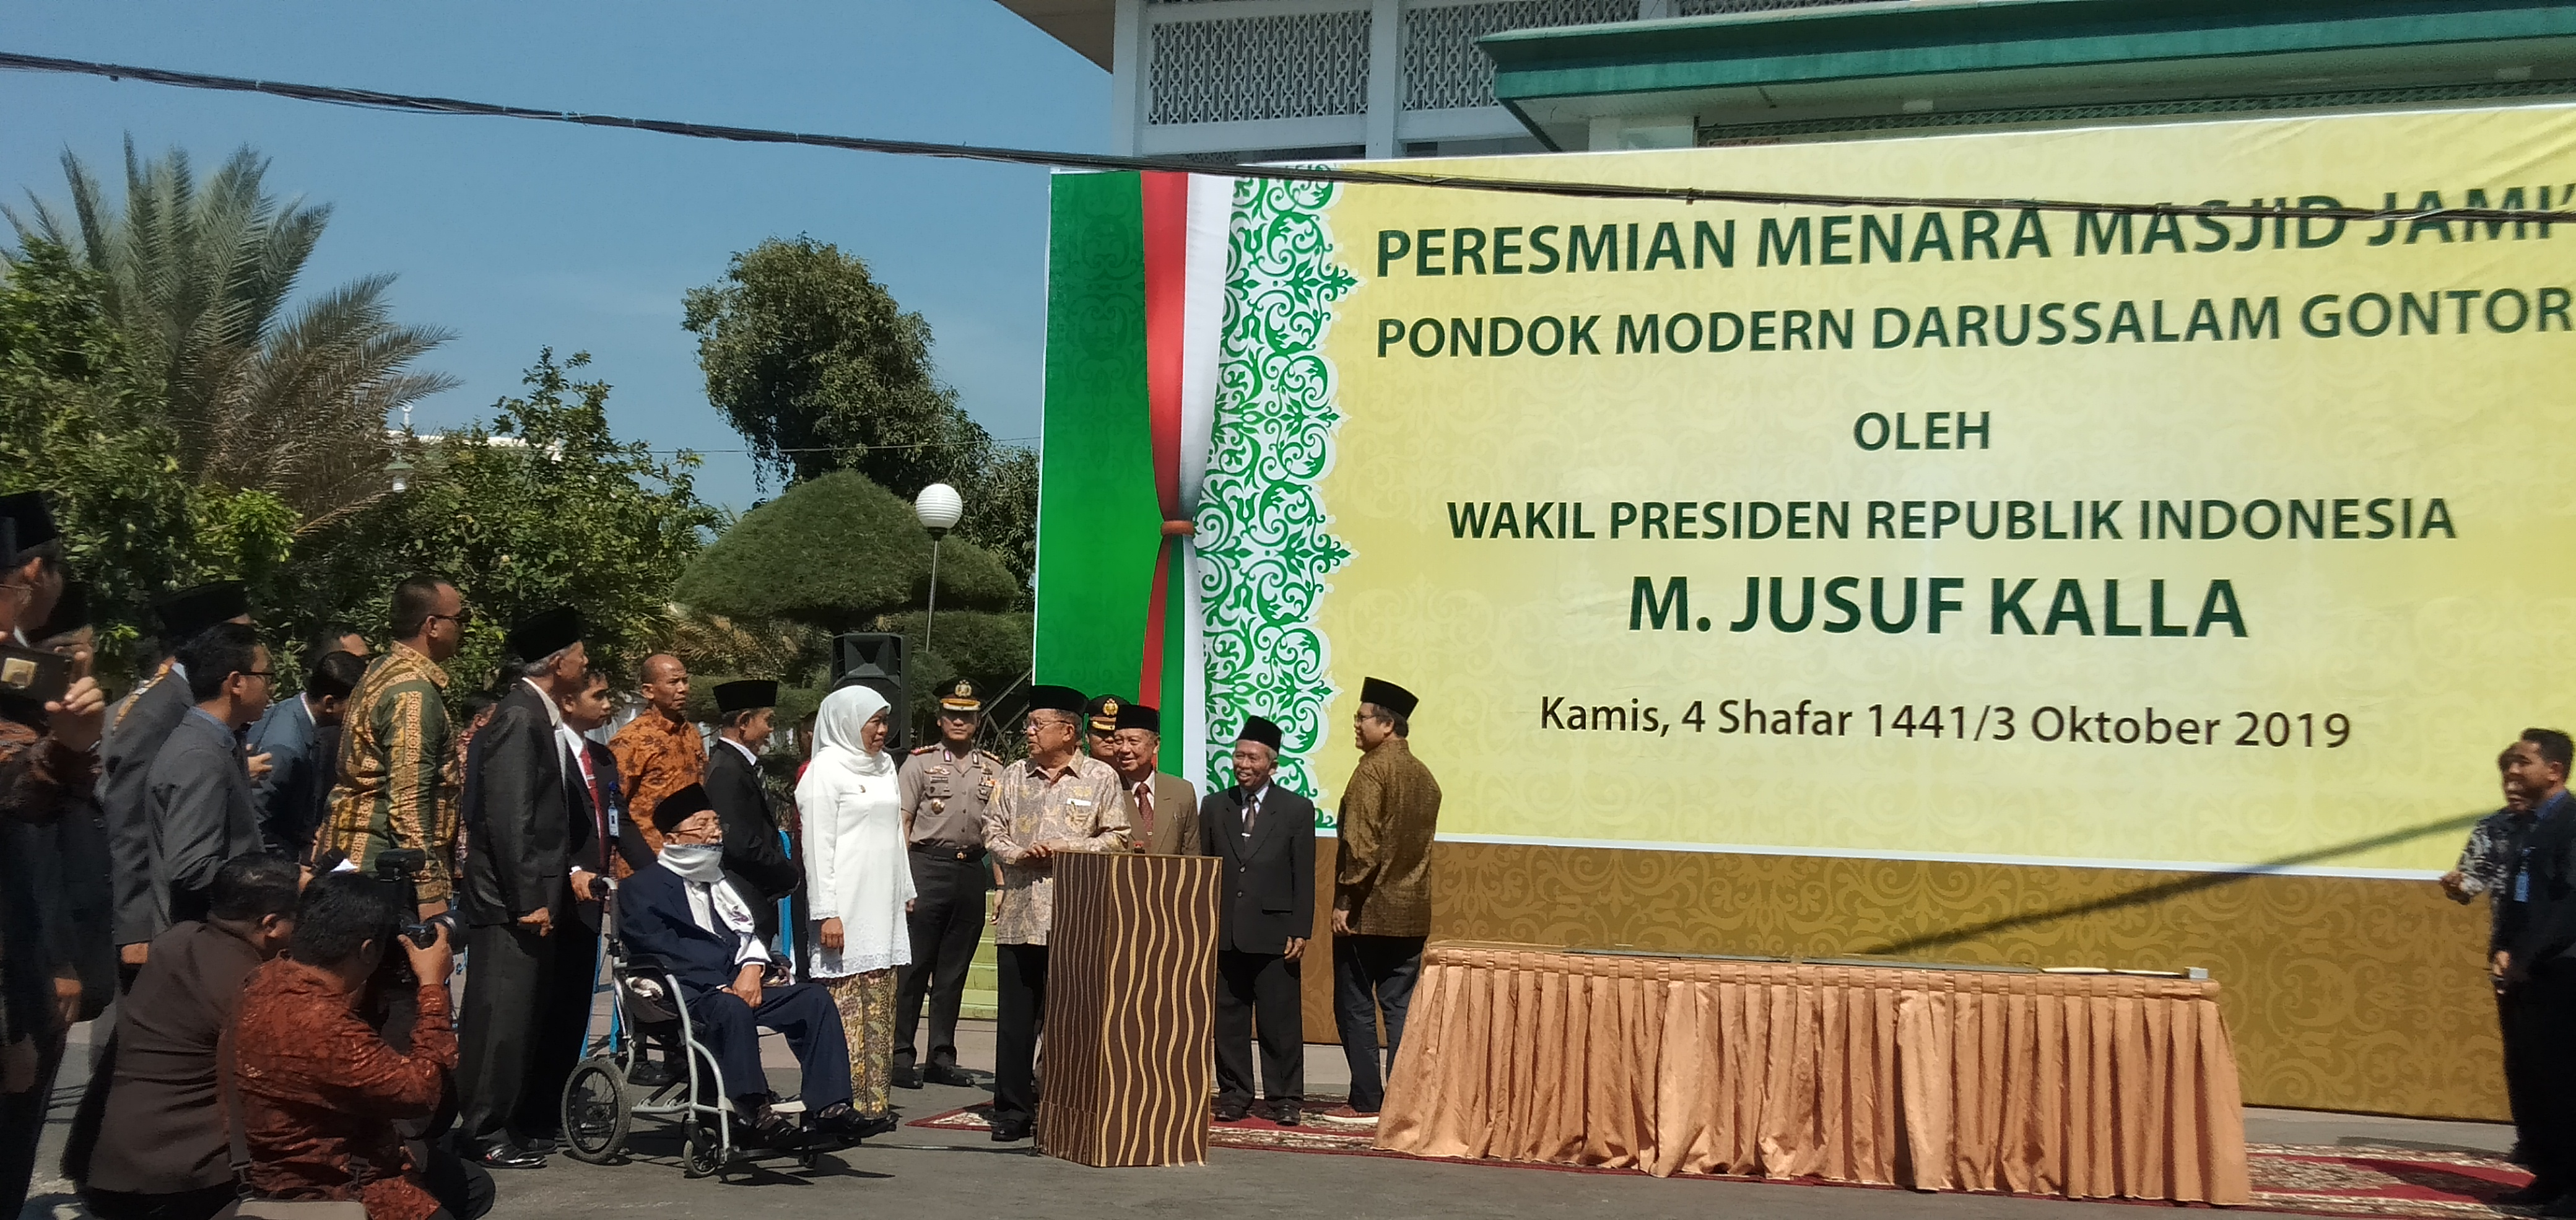 Jk Wakafkan Gedung Rp 11 M Gontor Nkri Sampai Mati Duta Co